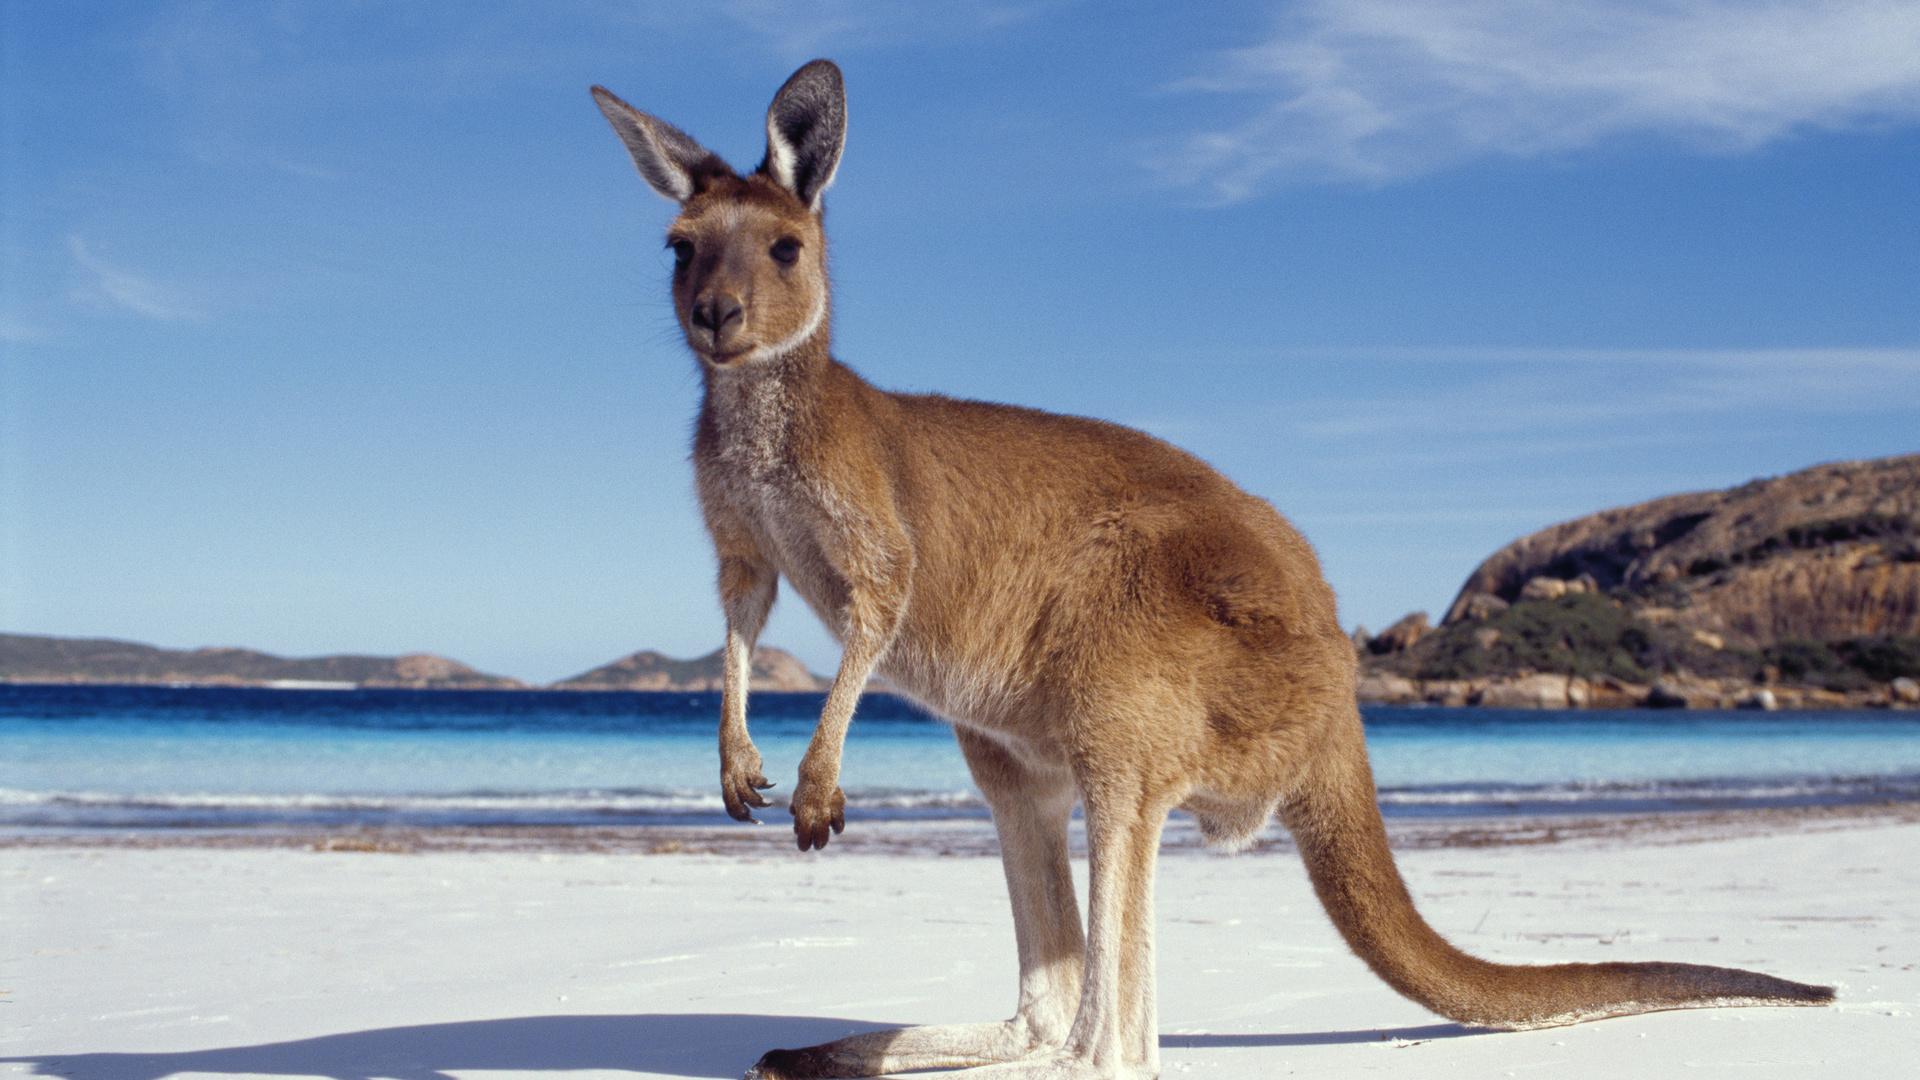 Австралия картинки для презентации, очки